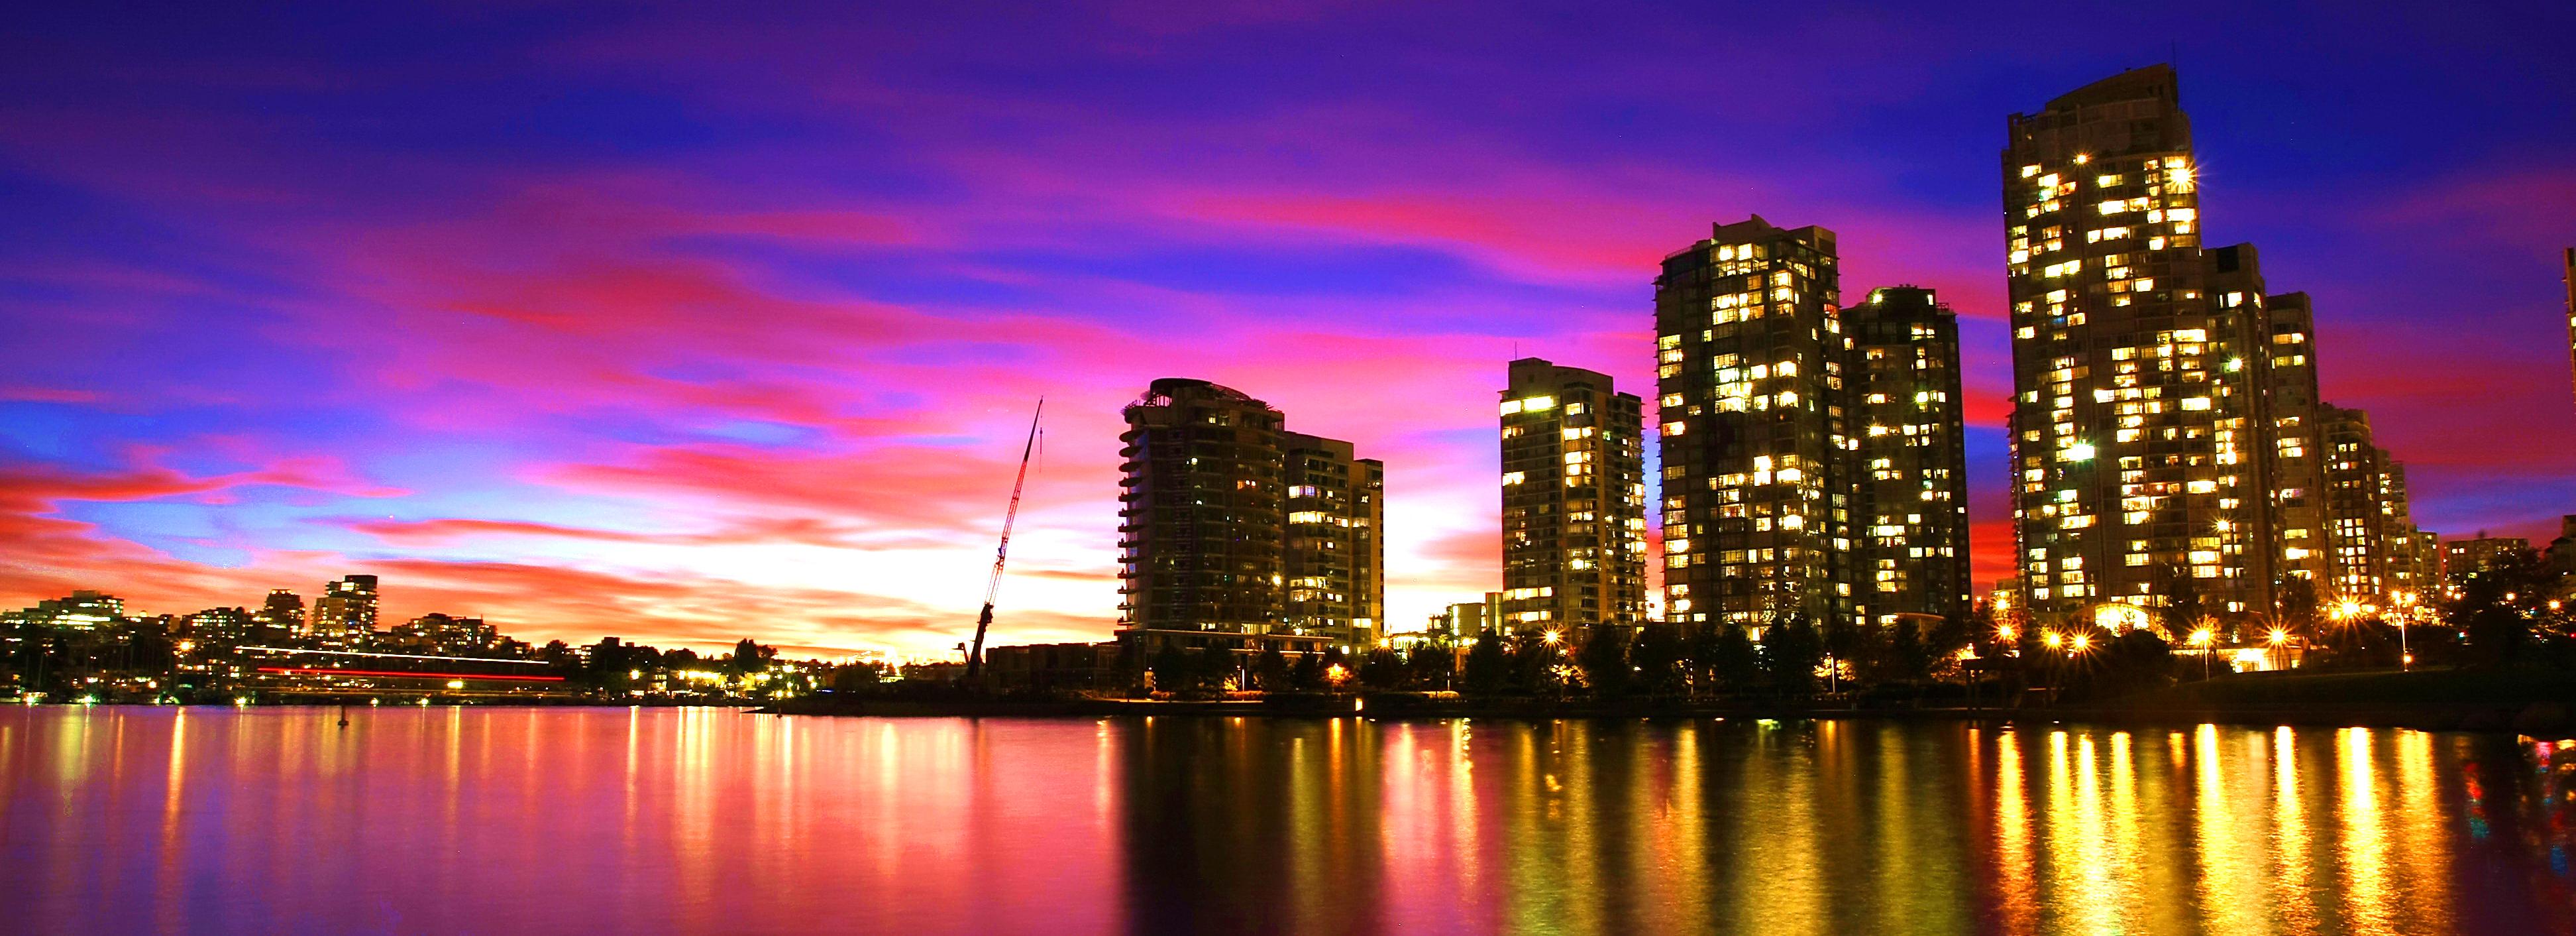 sunset-113039.jpg